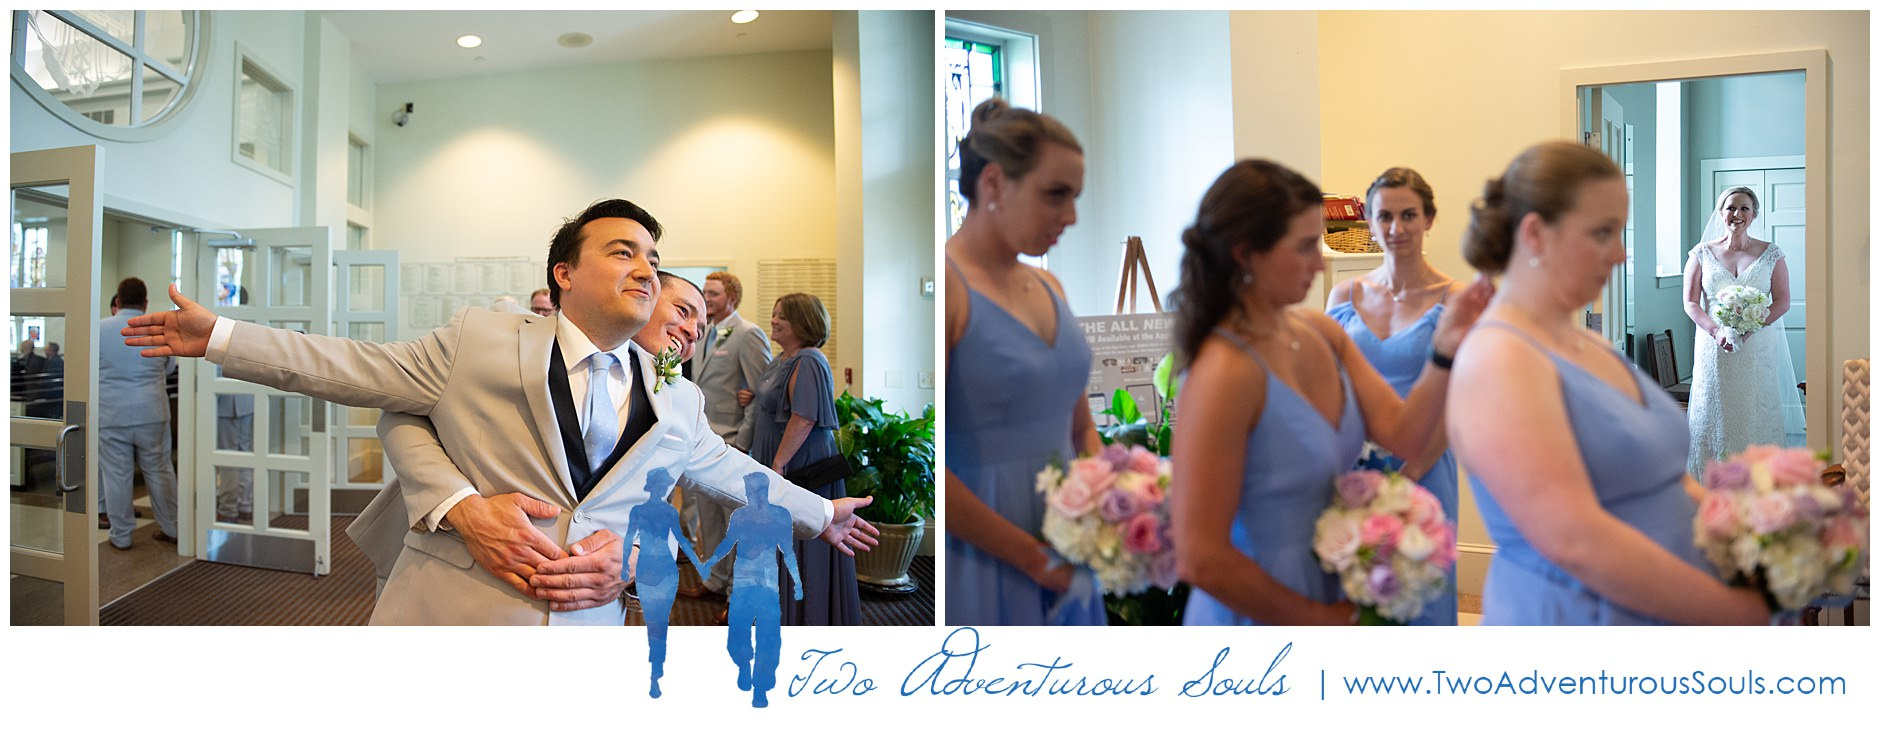 Cape Cod Wedding Photographers, Destination Wedding Photographers, Two Adventurous Souls-081019_0017.jpg